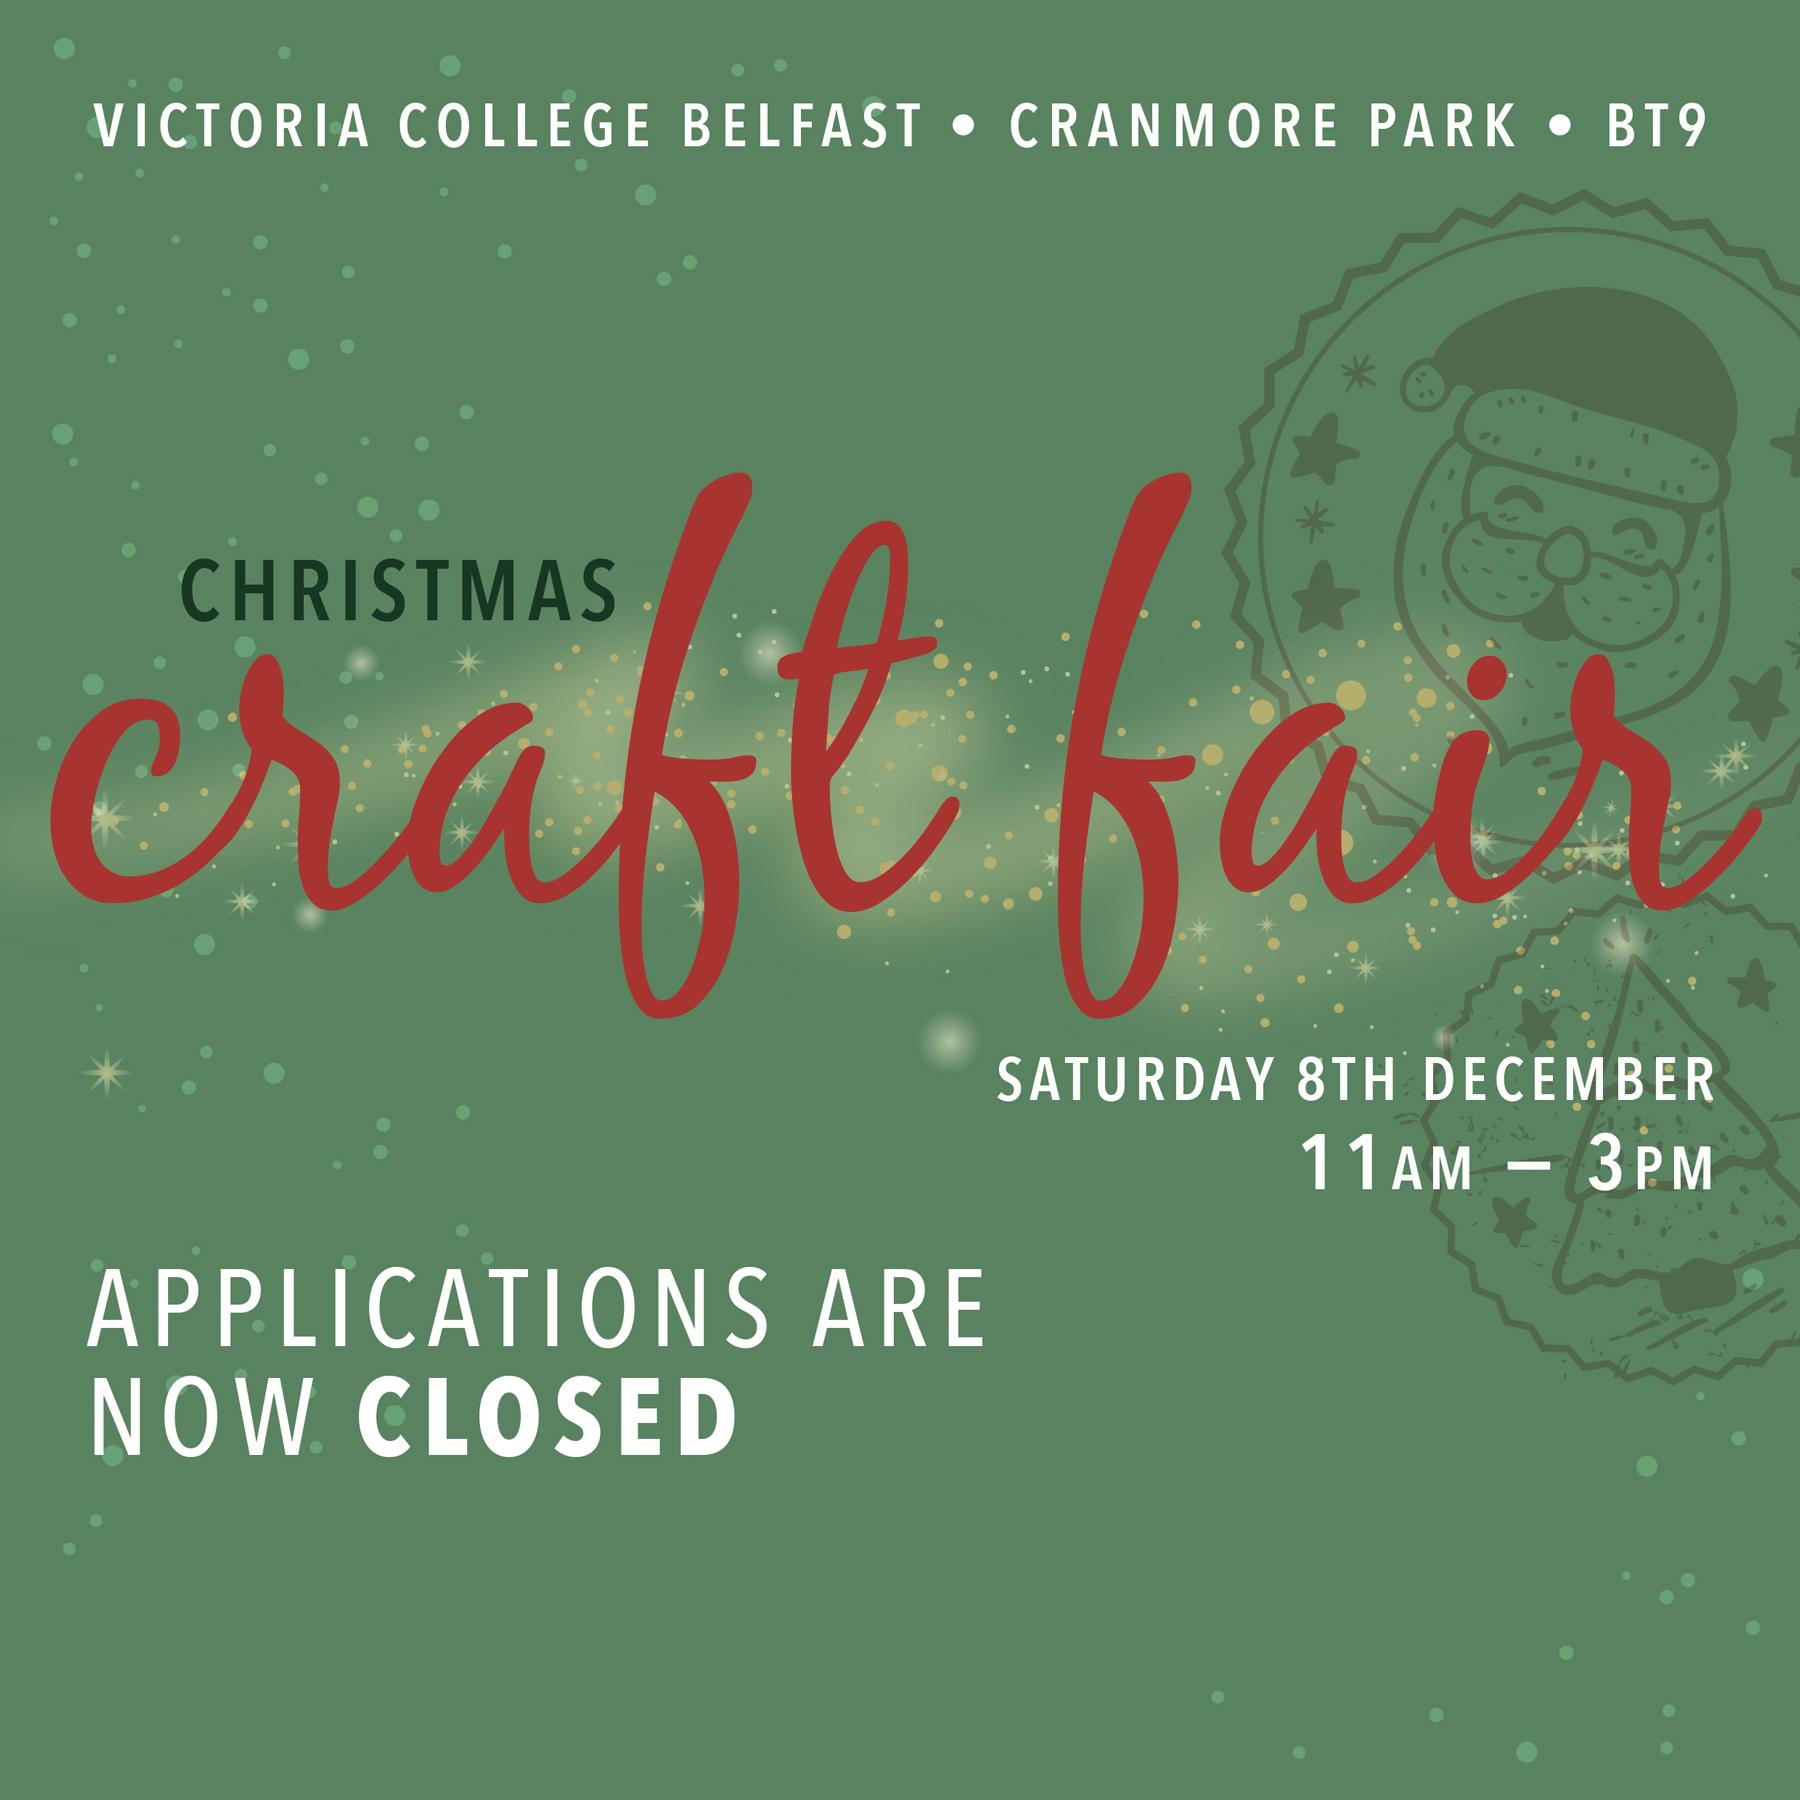 VCB-Craft-Fair-applications-closed-Poster-2018.jpg